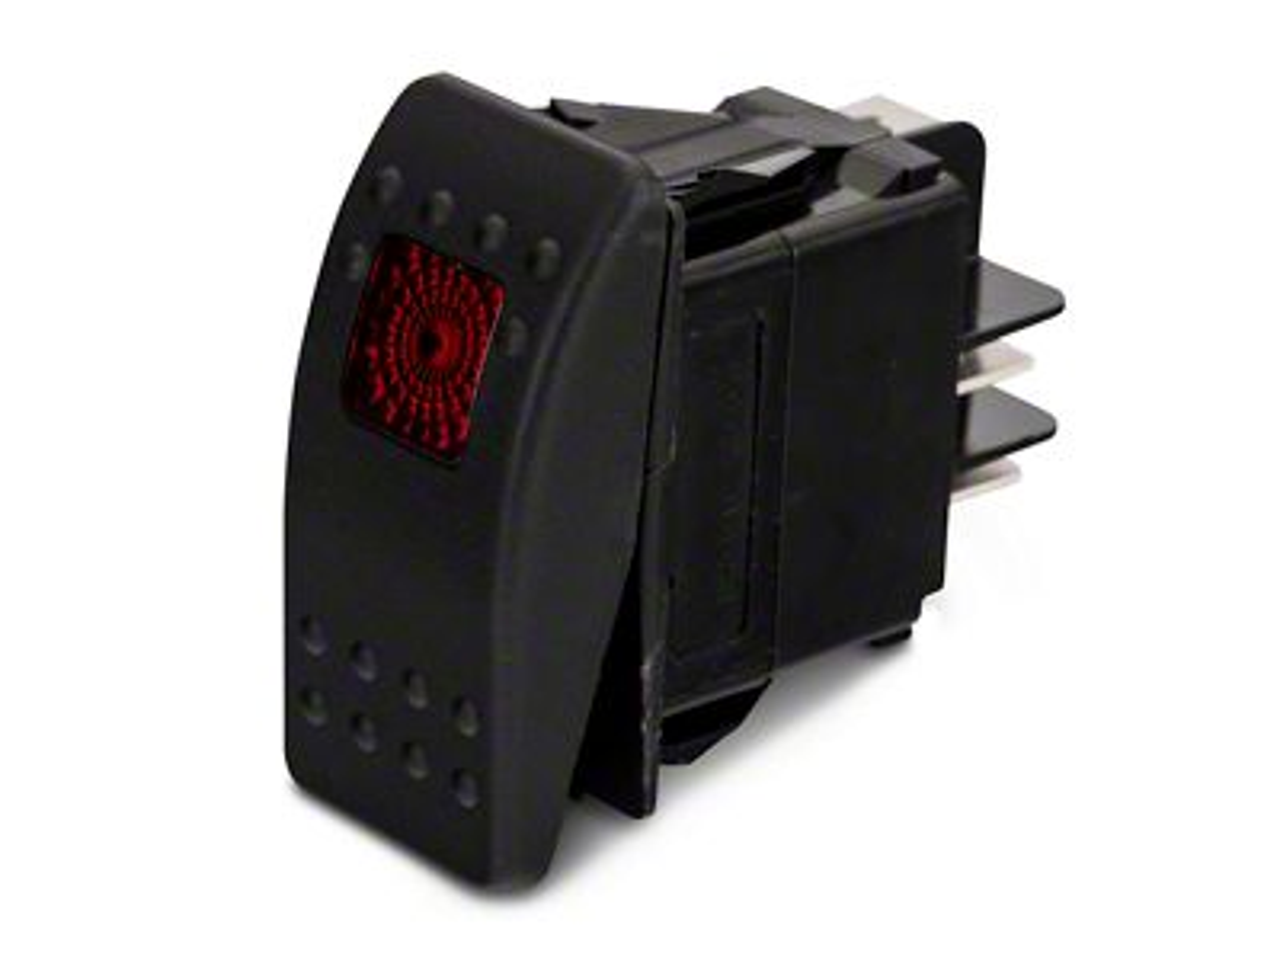 Add Daystar Rocker Switch - Red Light (87-17 Wrangler YJ, TJ, & JK)